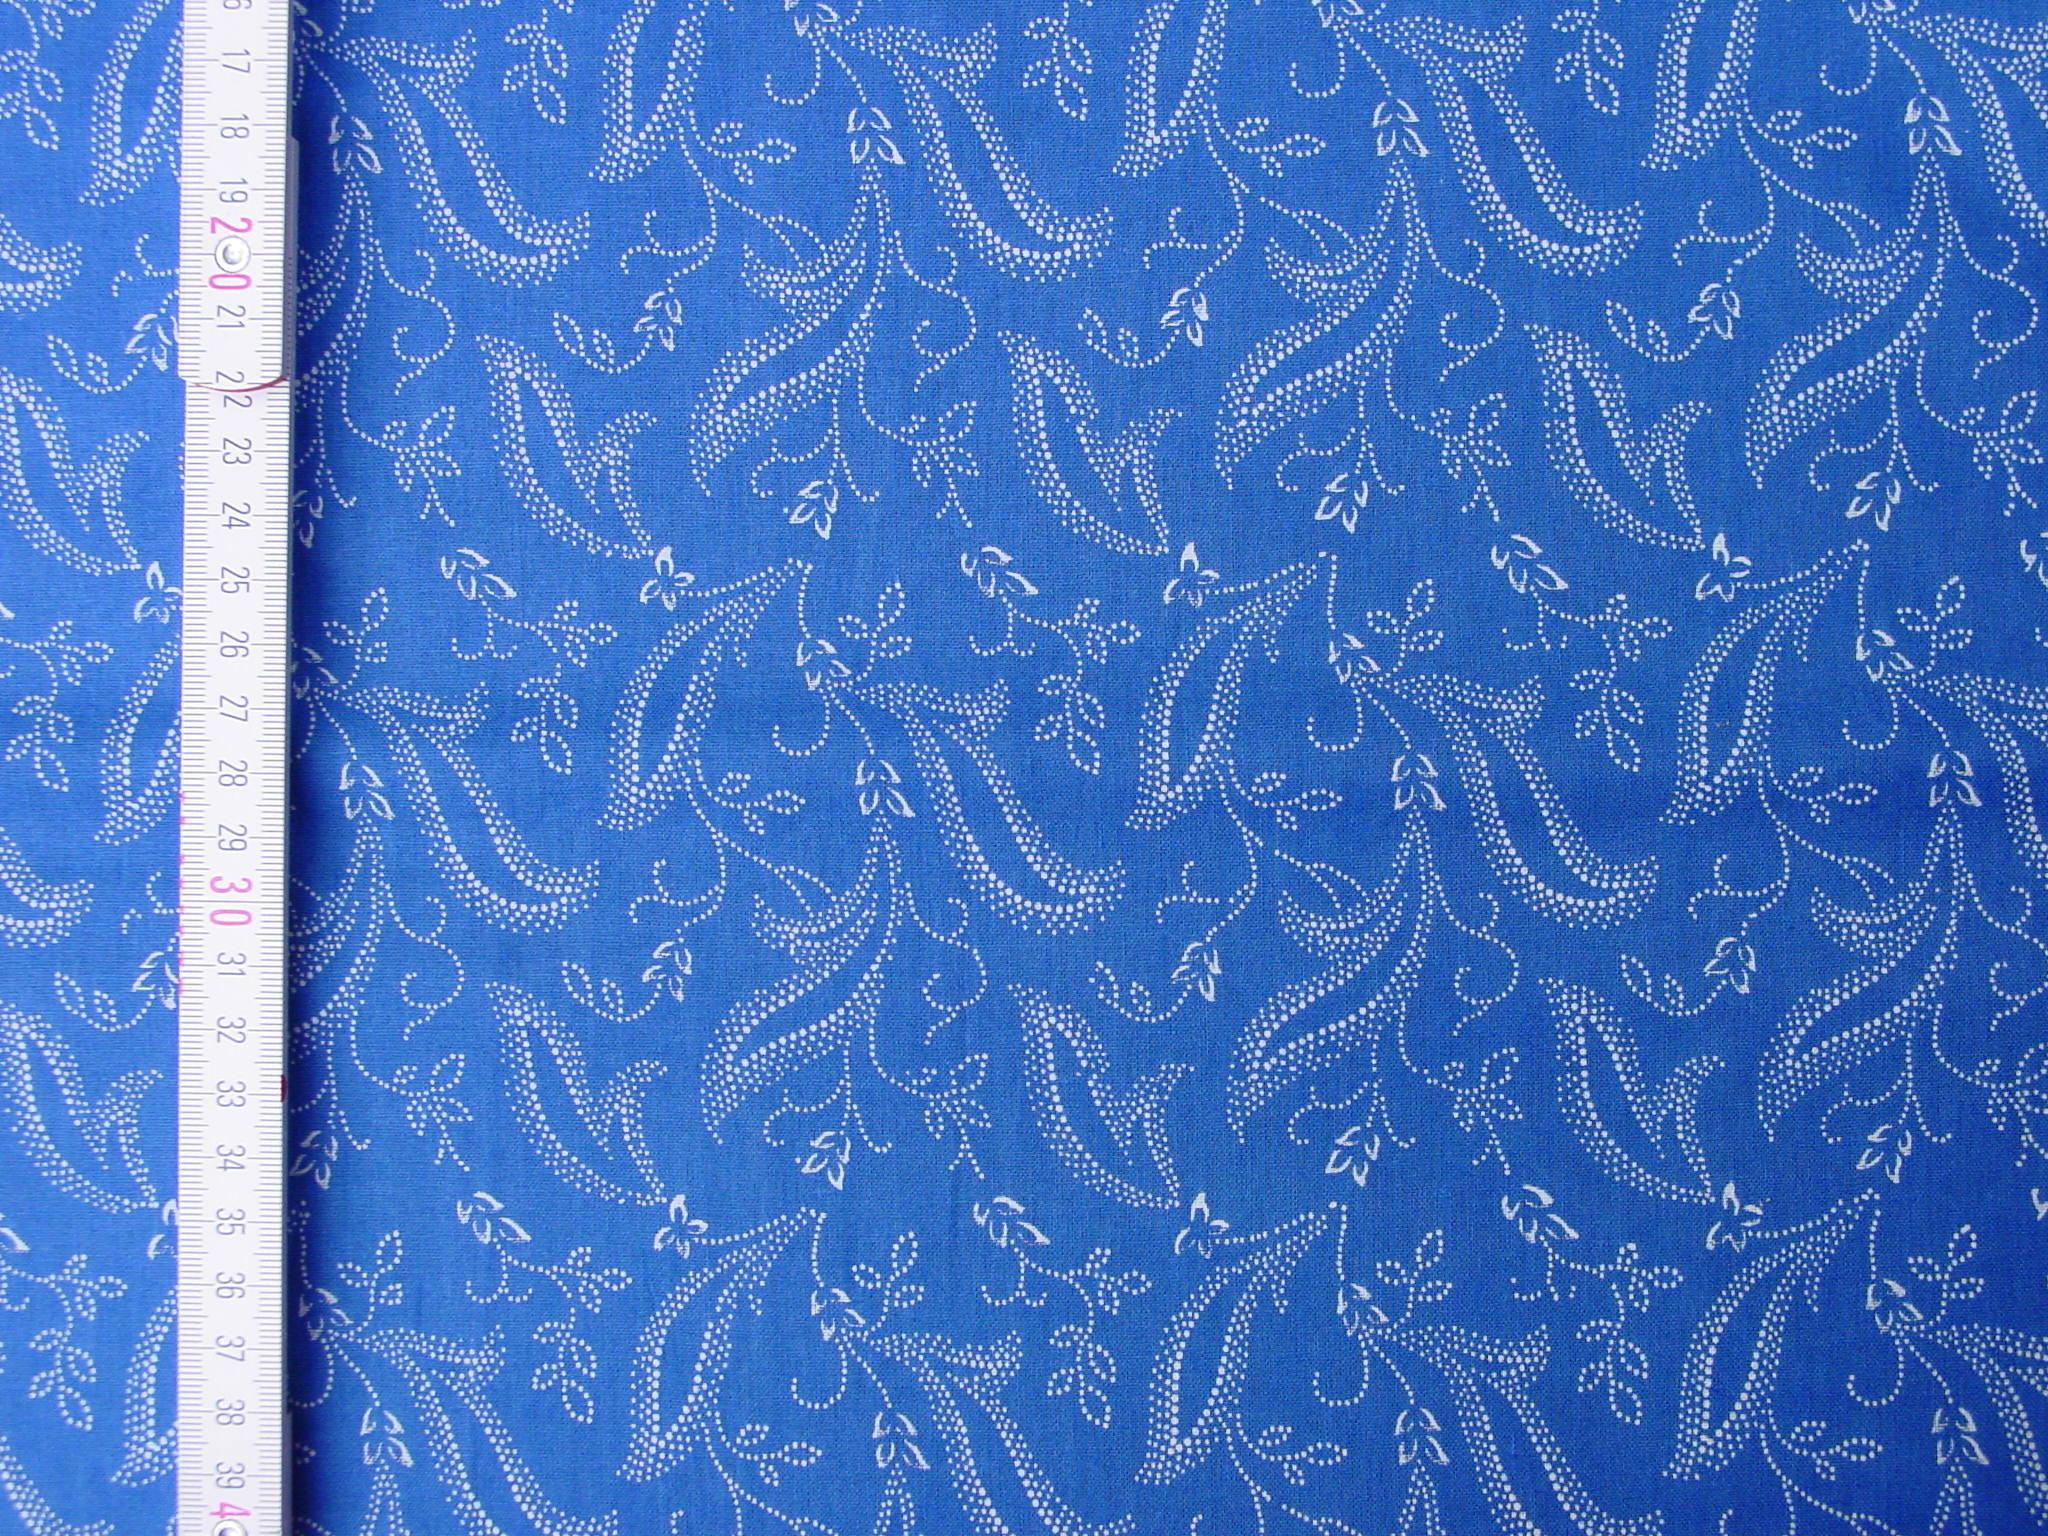 Blaudruckstoff 144-0